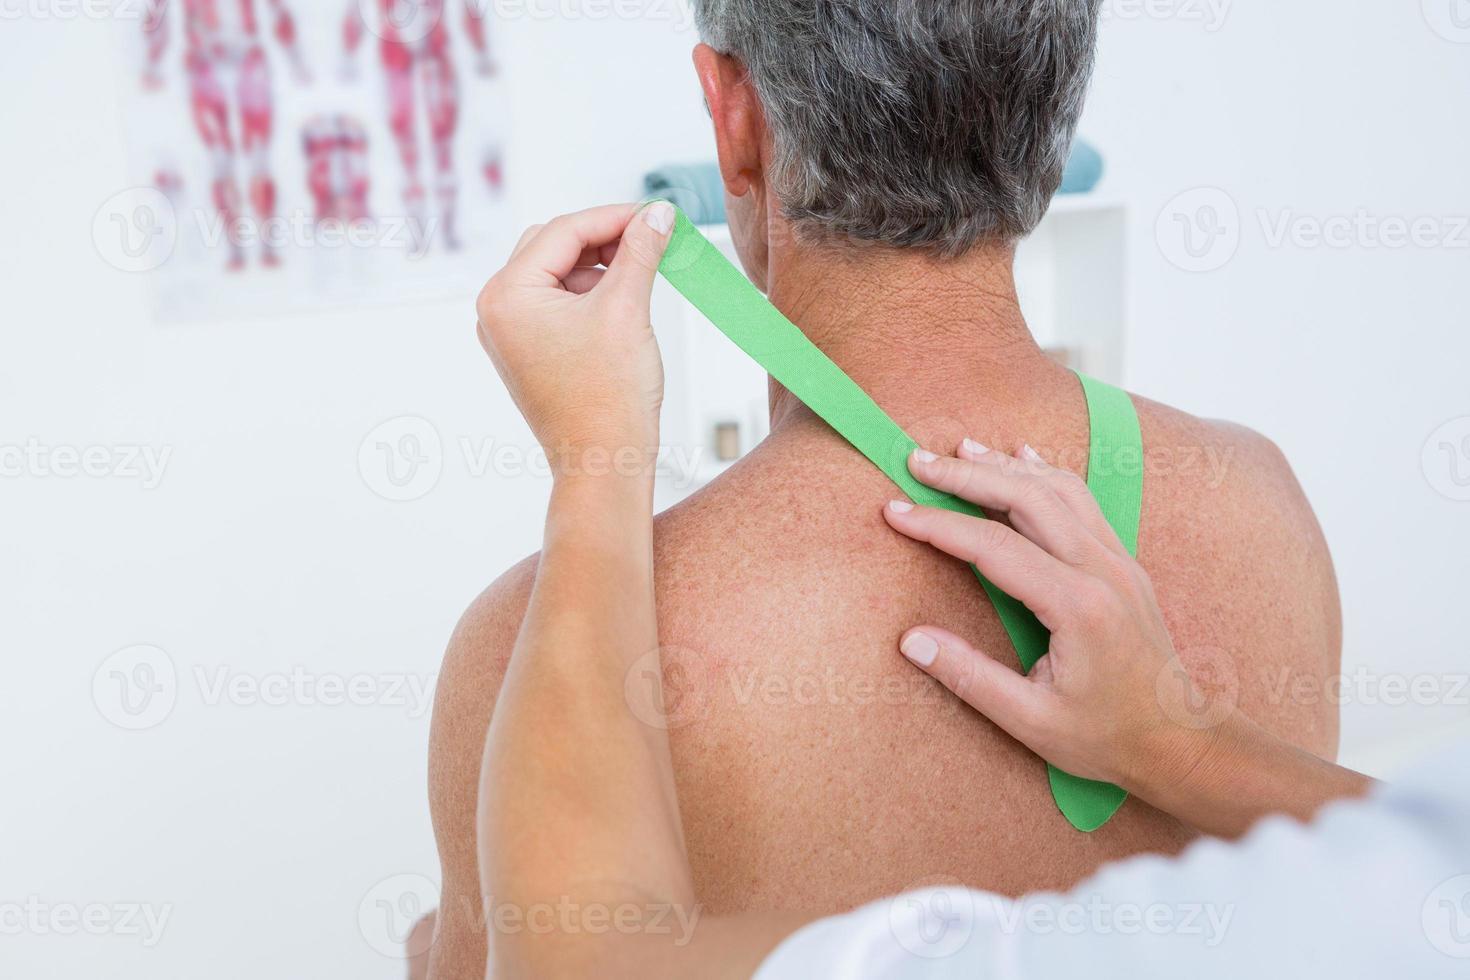 läkare undersöker hennes patientens axel foto